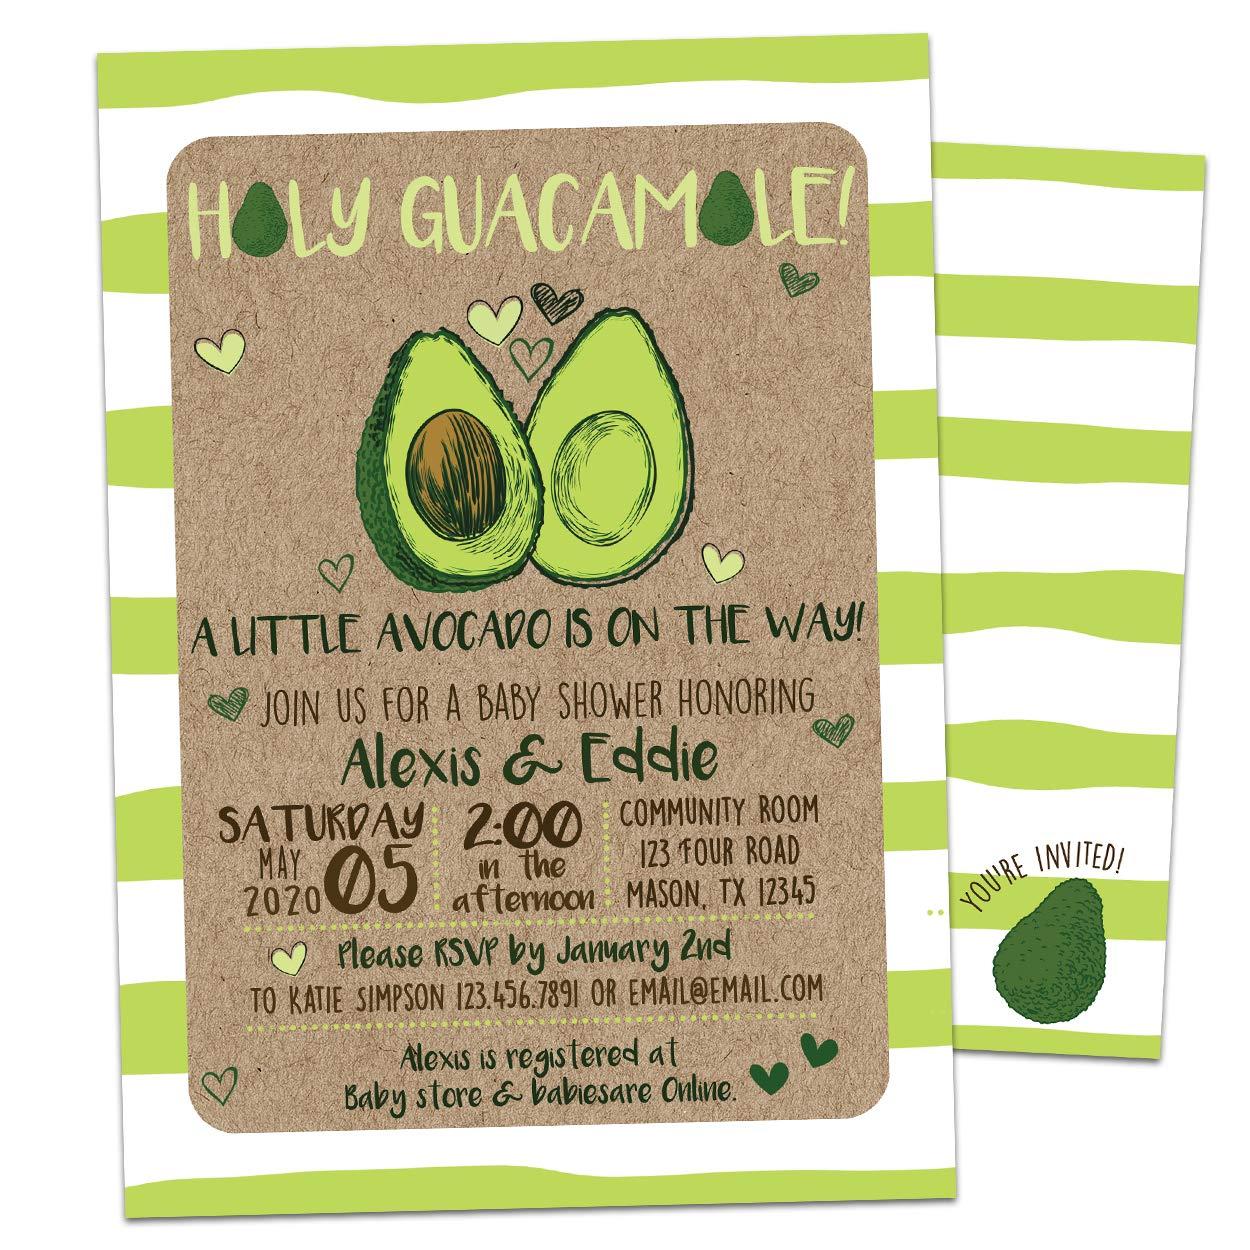 Avocado Invitation Holy Guacmole Baby Shower Br Classic High quality Invites Birthday